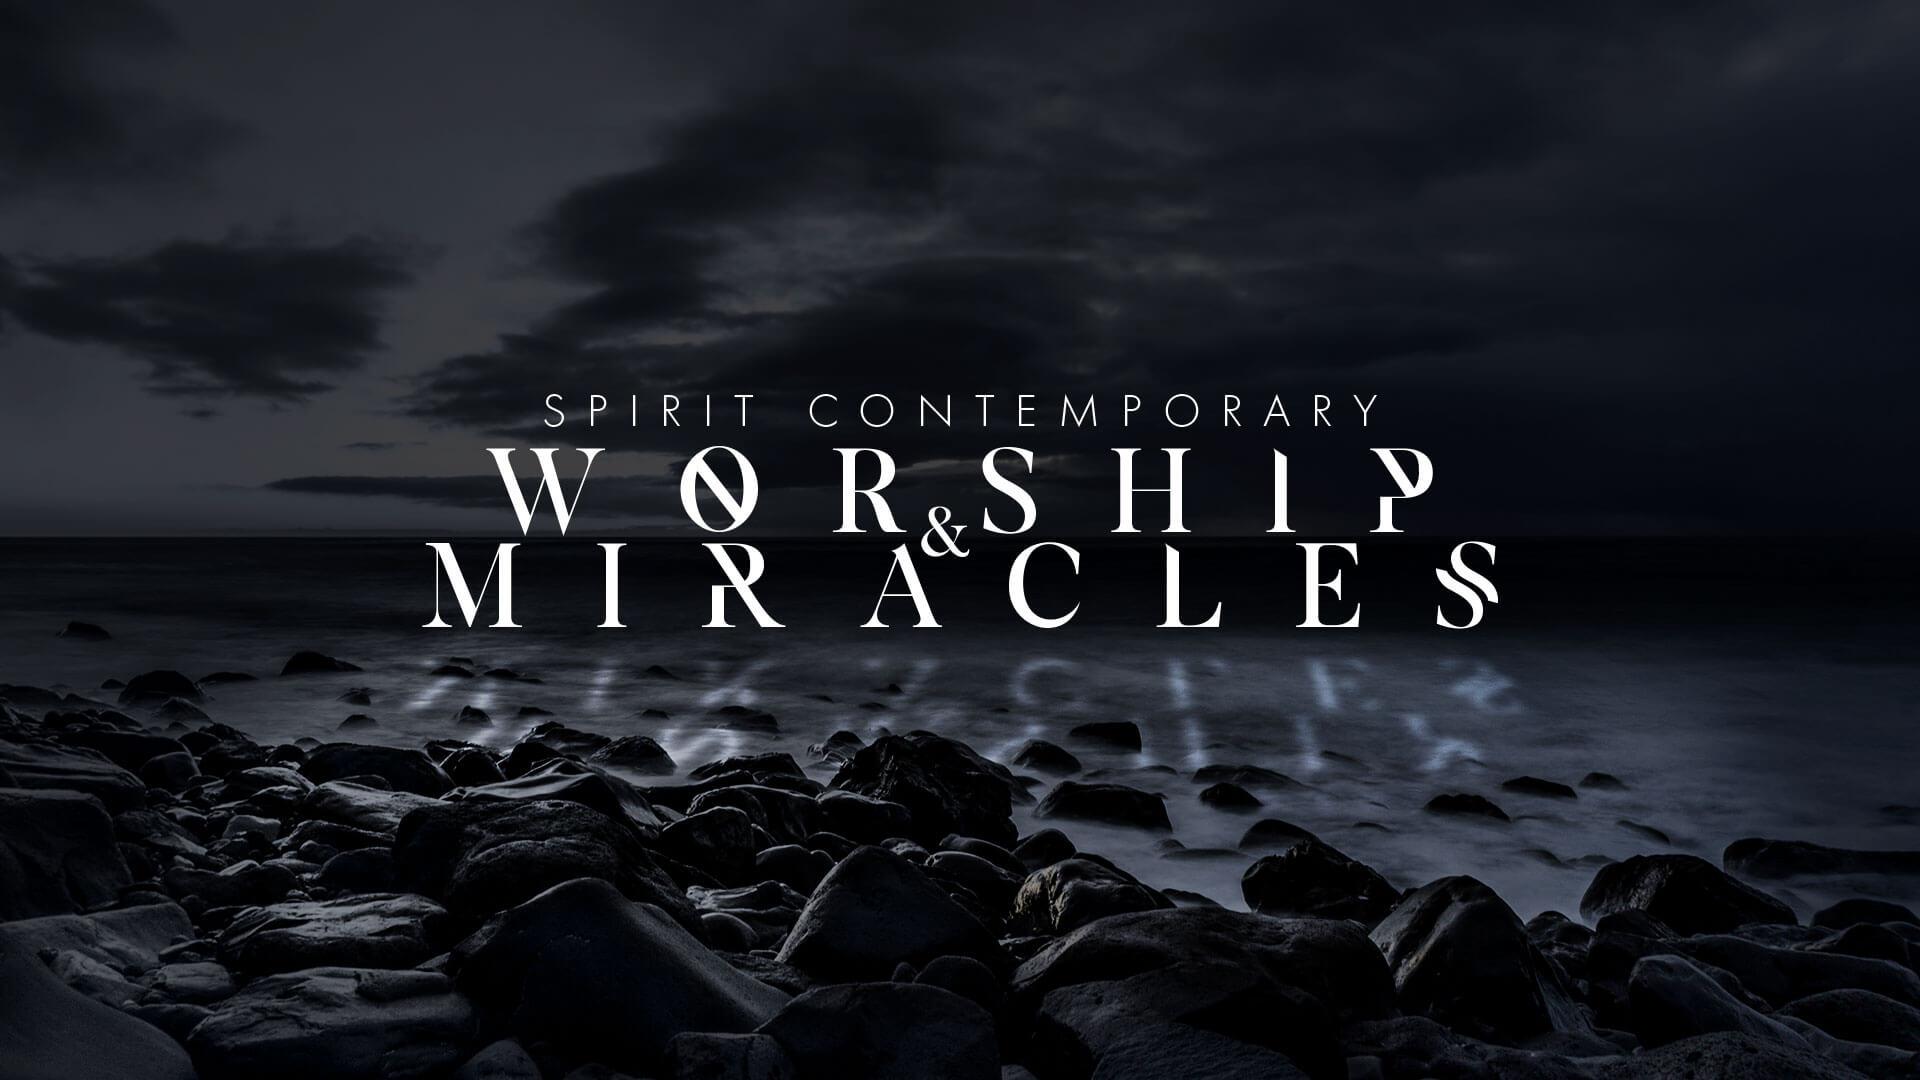 Spirit Contemporary Worship and Miracles